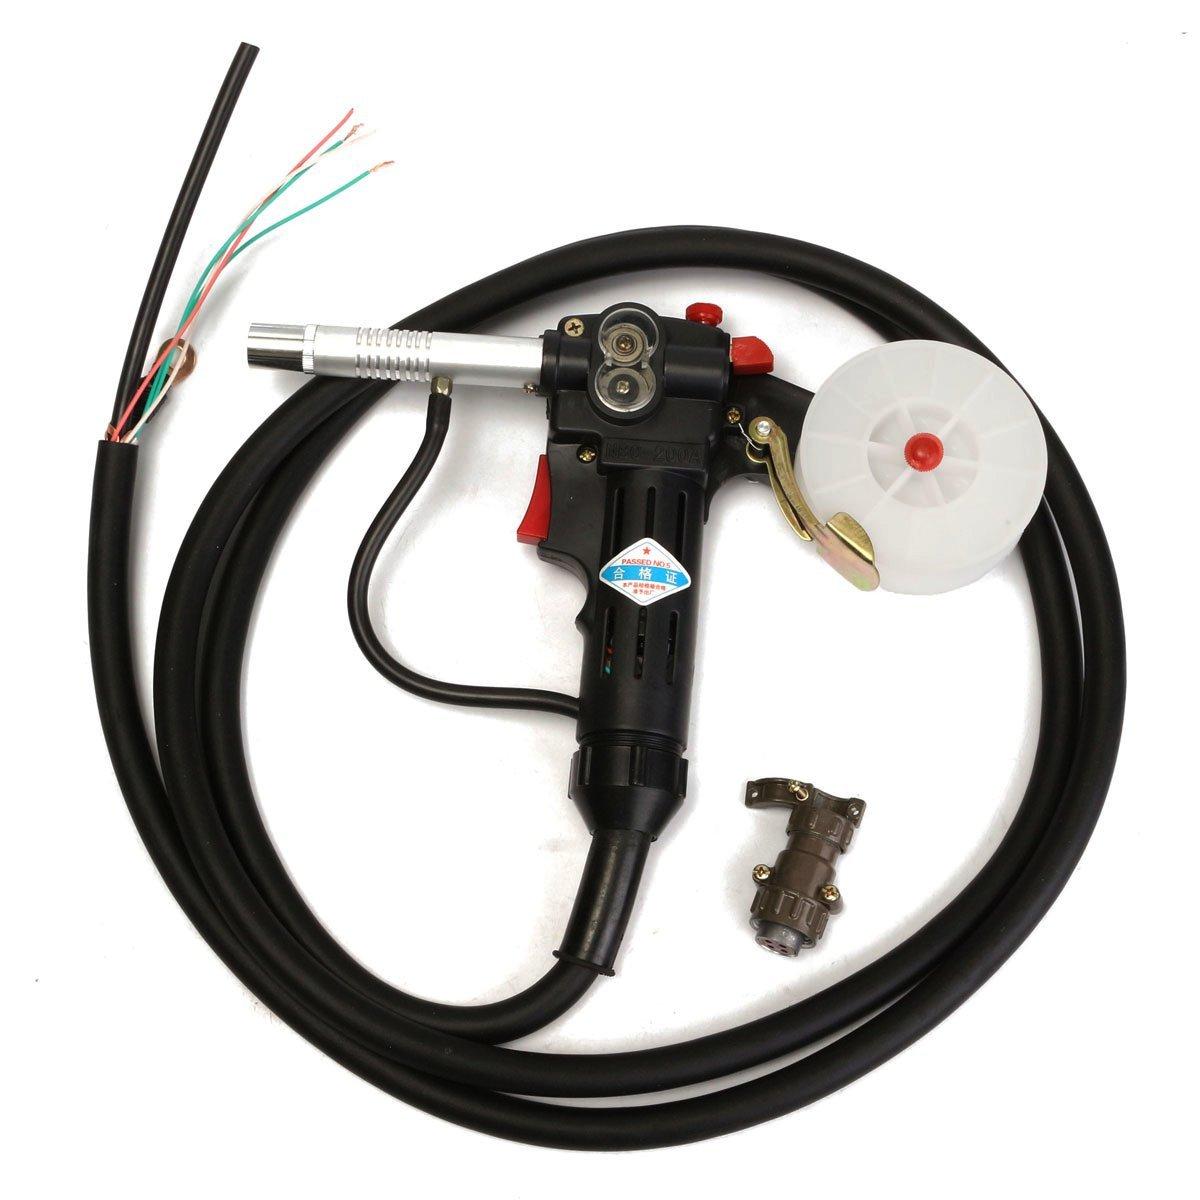 KISENG Spool Gun Gas Shielded Welding Gun Push Pull Aluminum Torch with 3M Cable